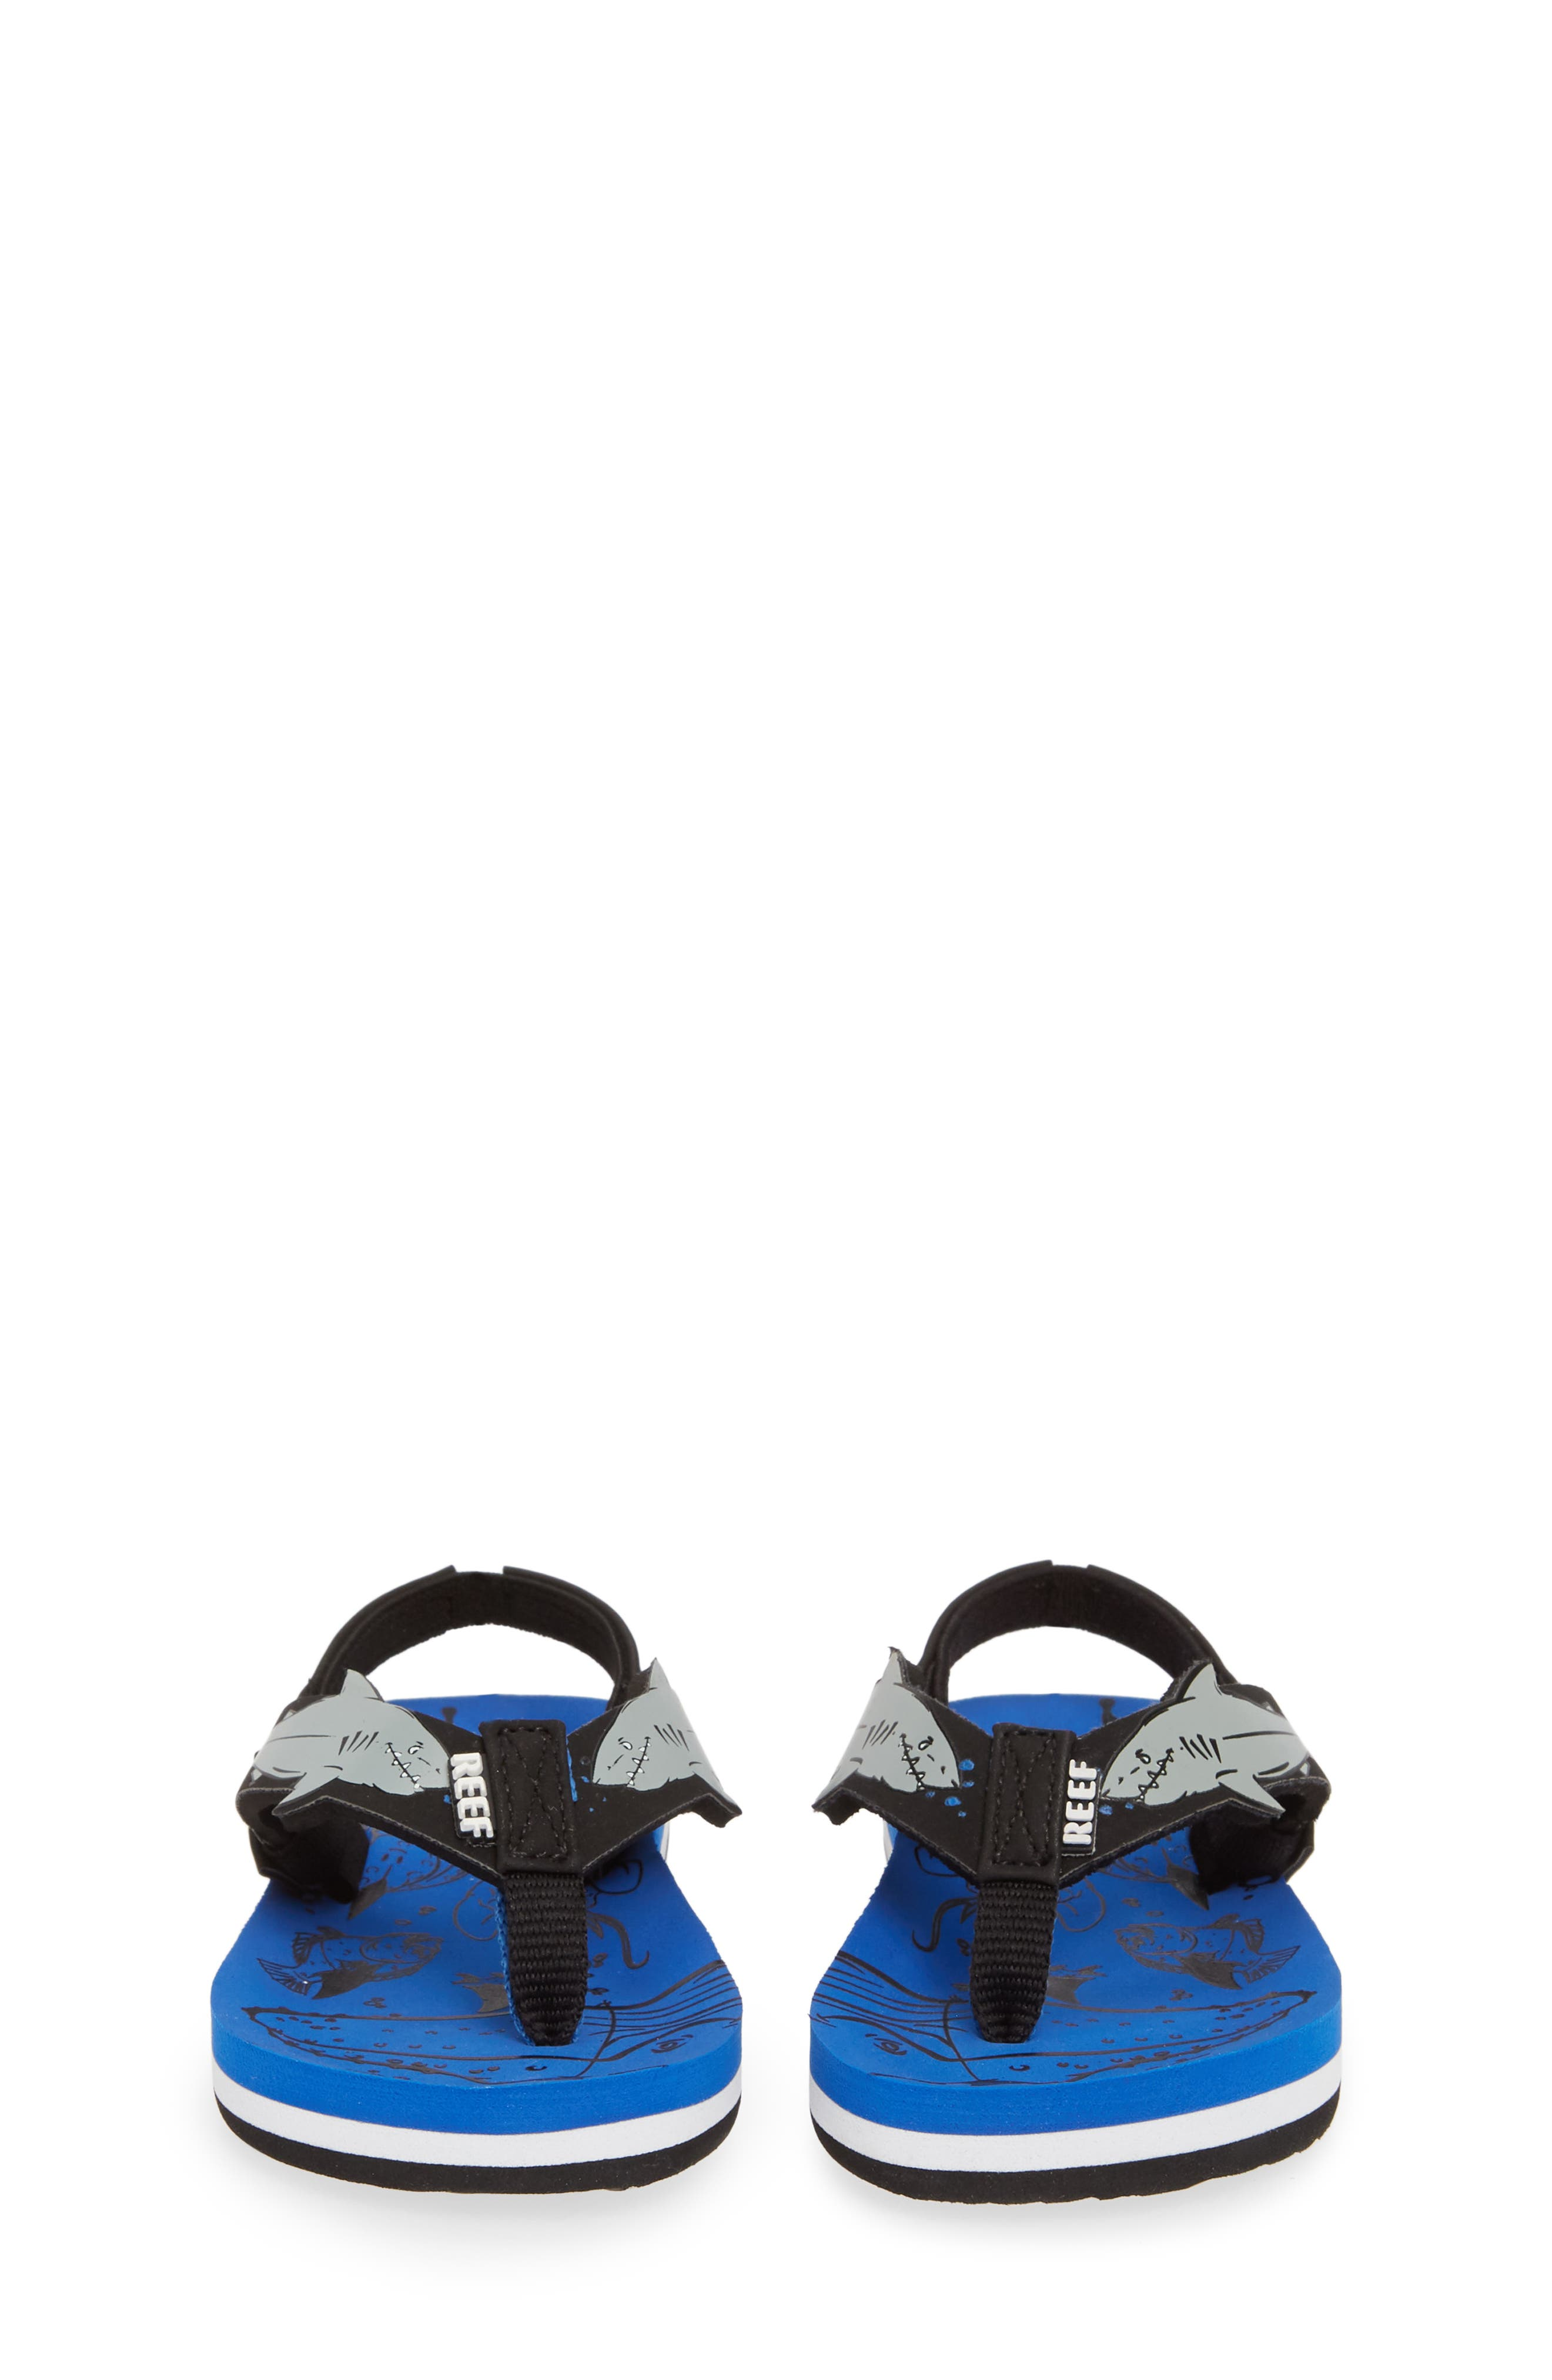 REEF, Ahi Shark Flip Flop, Alternate thumbnail 5, color, BLUE